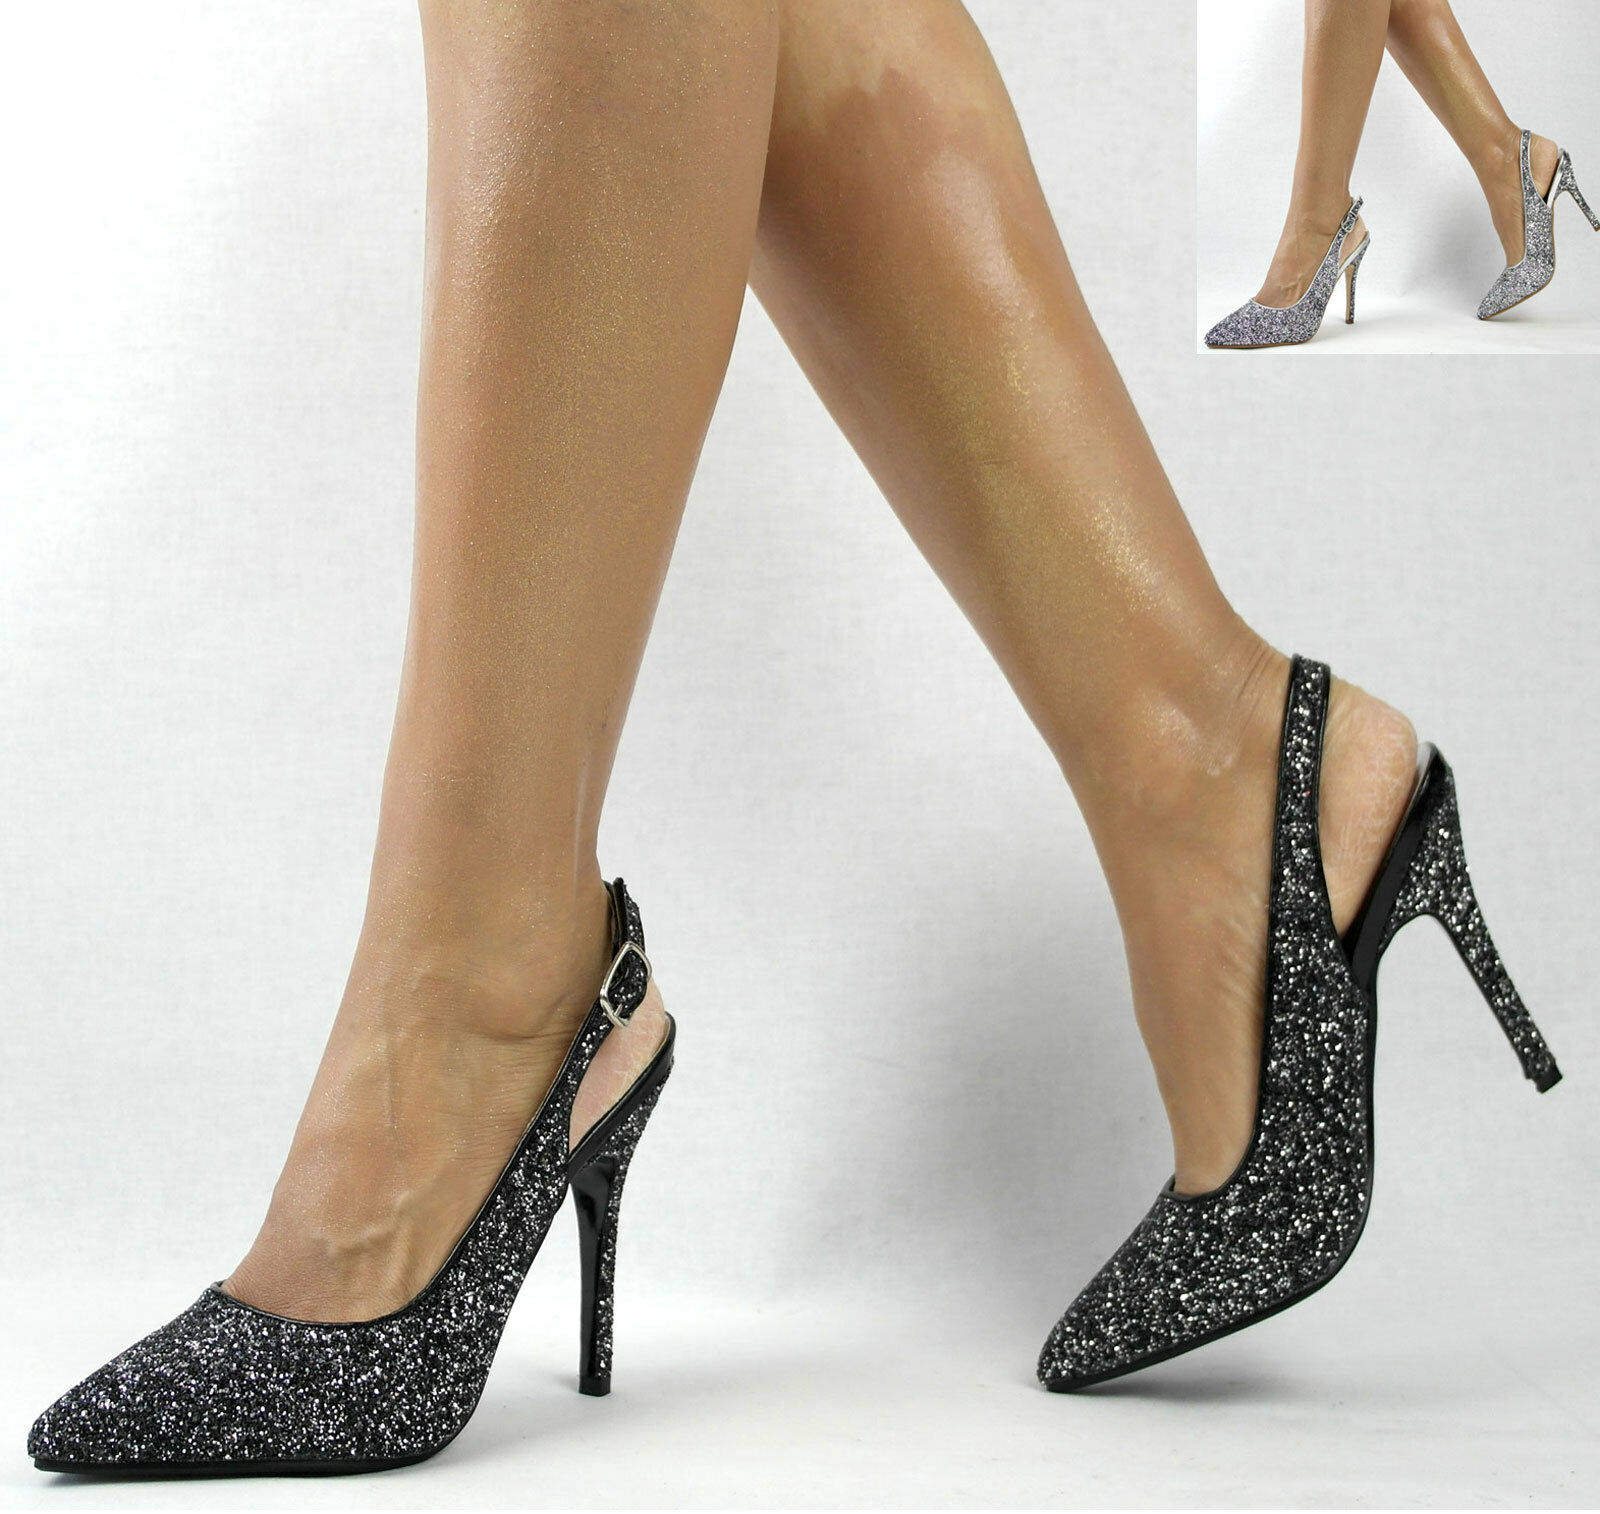 Damenzapatos Pumps 35-40 NEU Luxus Riemchen Pumps Damenzapatos Damen zapatos Party High Heels Plateau b8a7bf